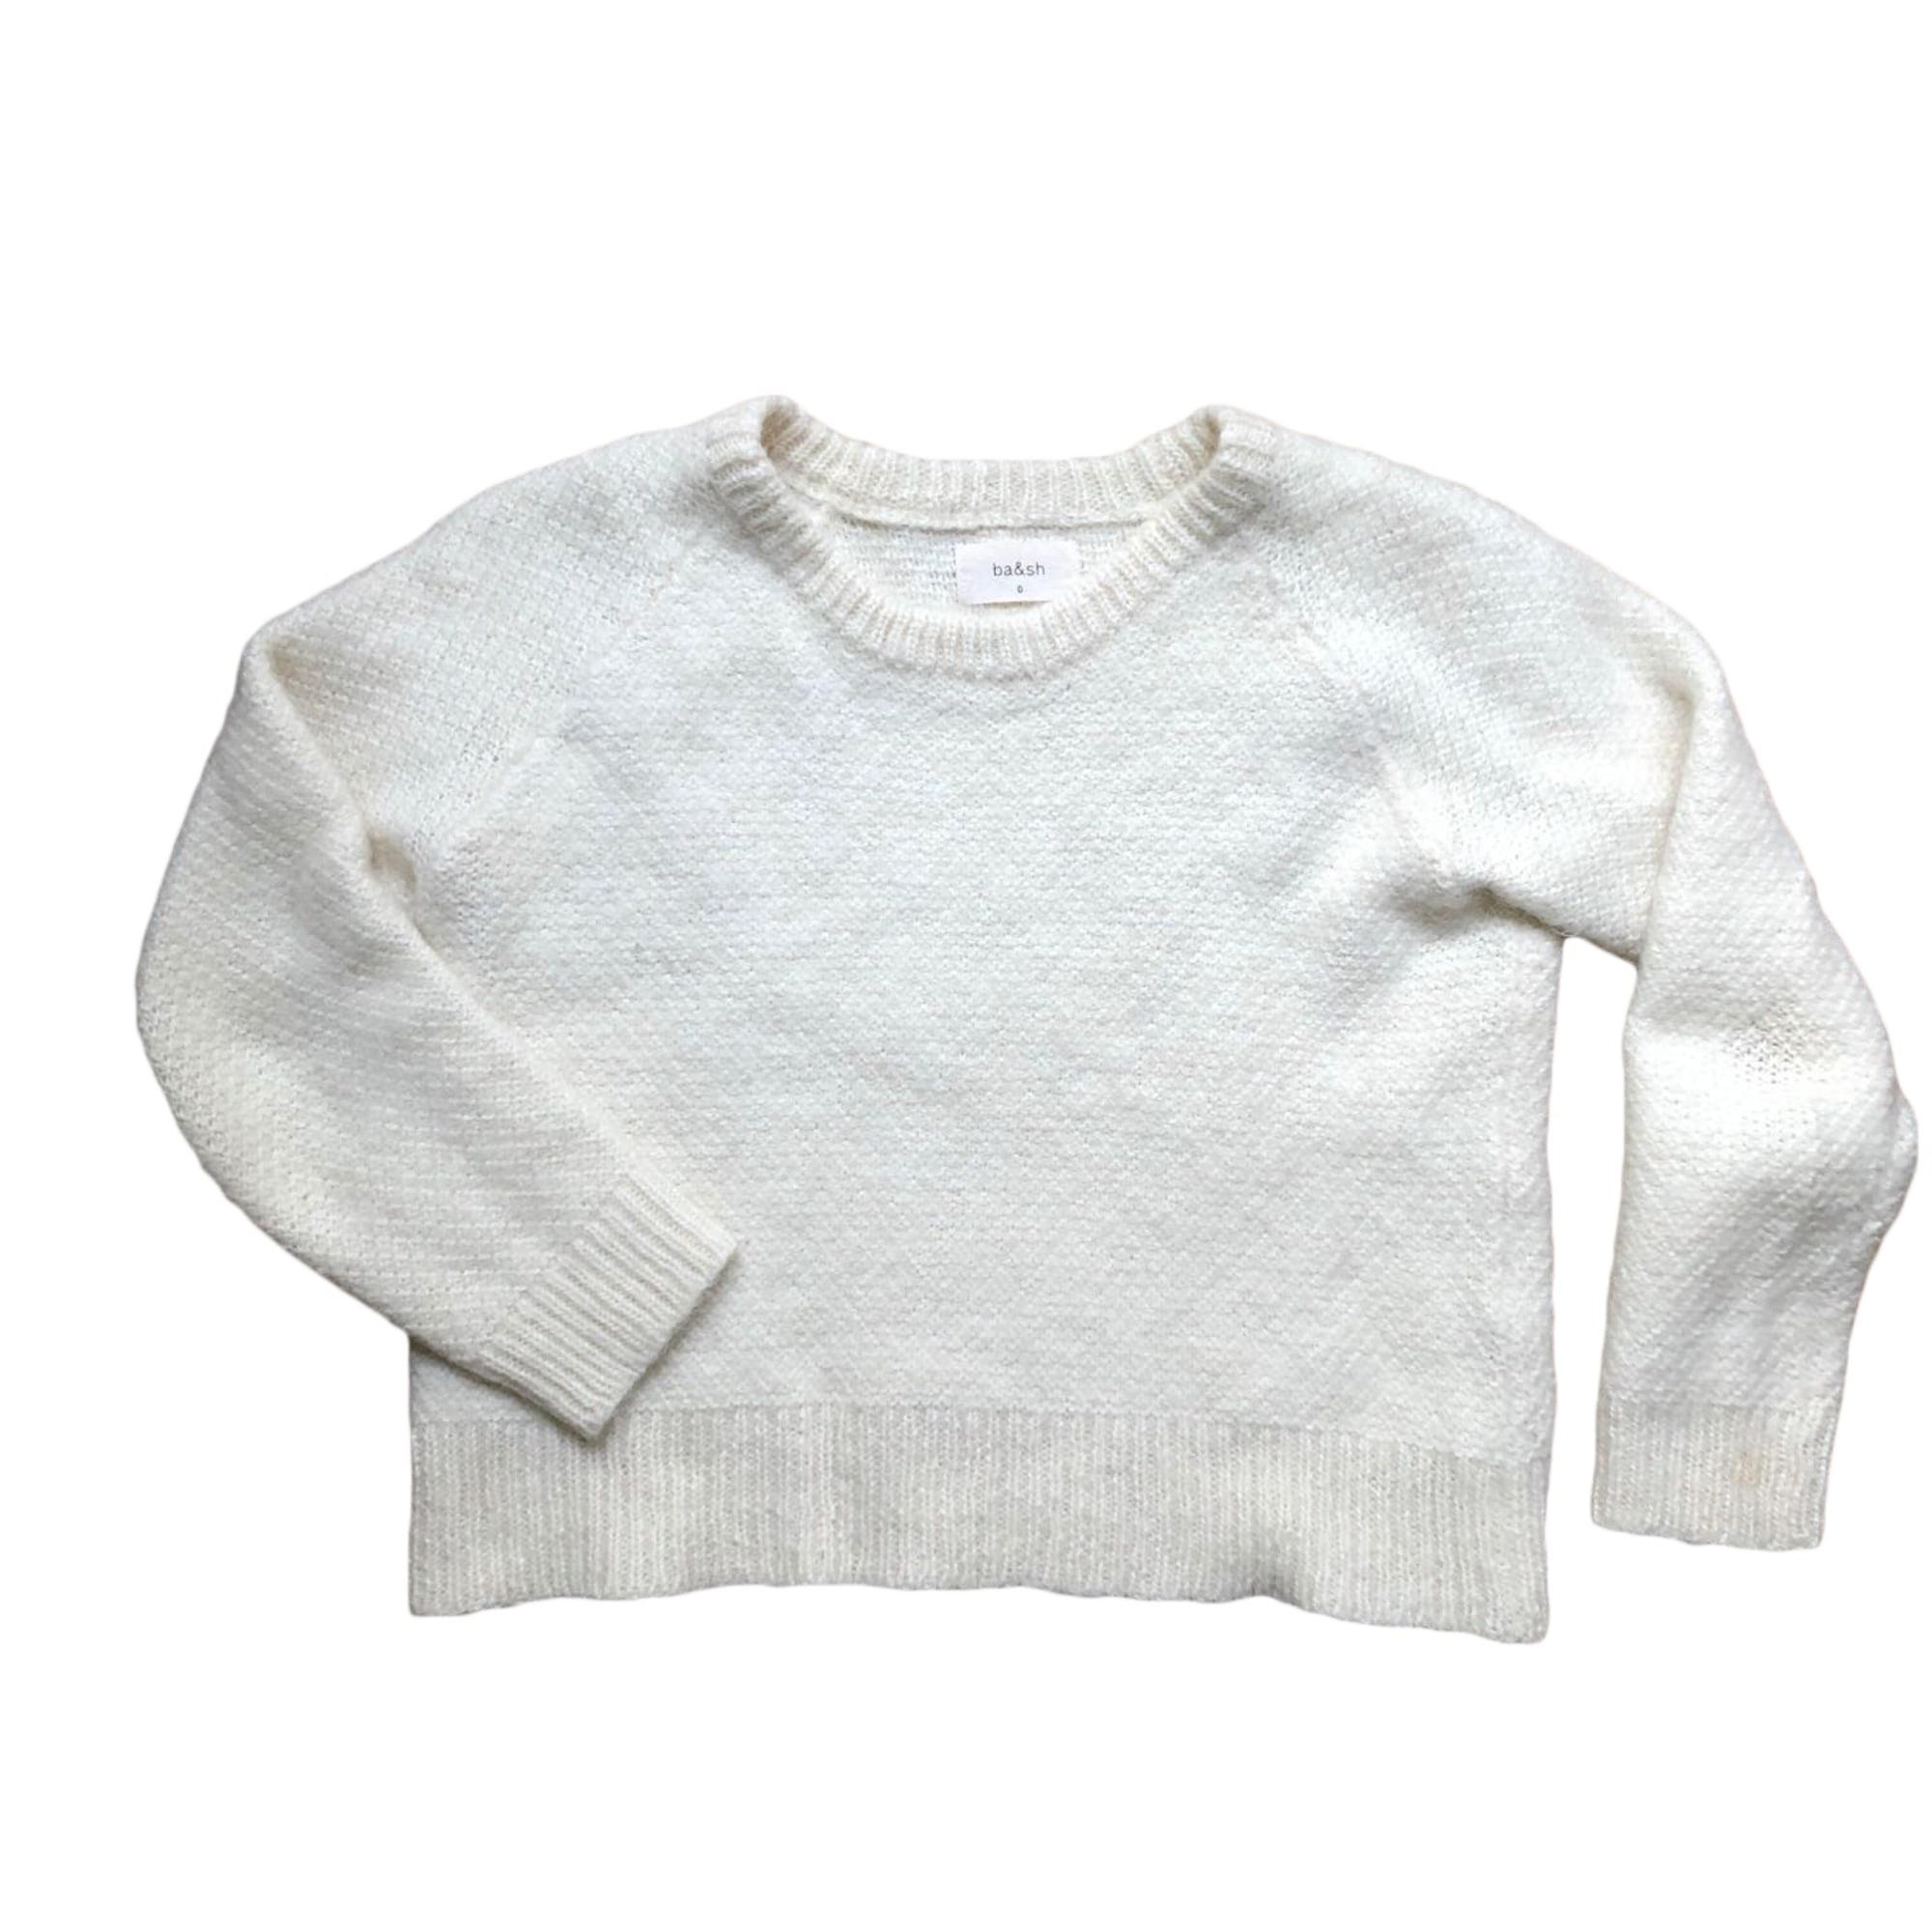 Sweater BA&SH White, off-white, ecru